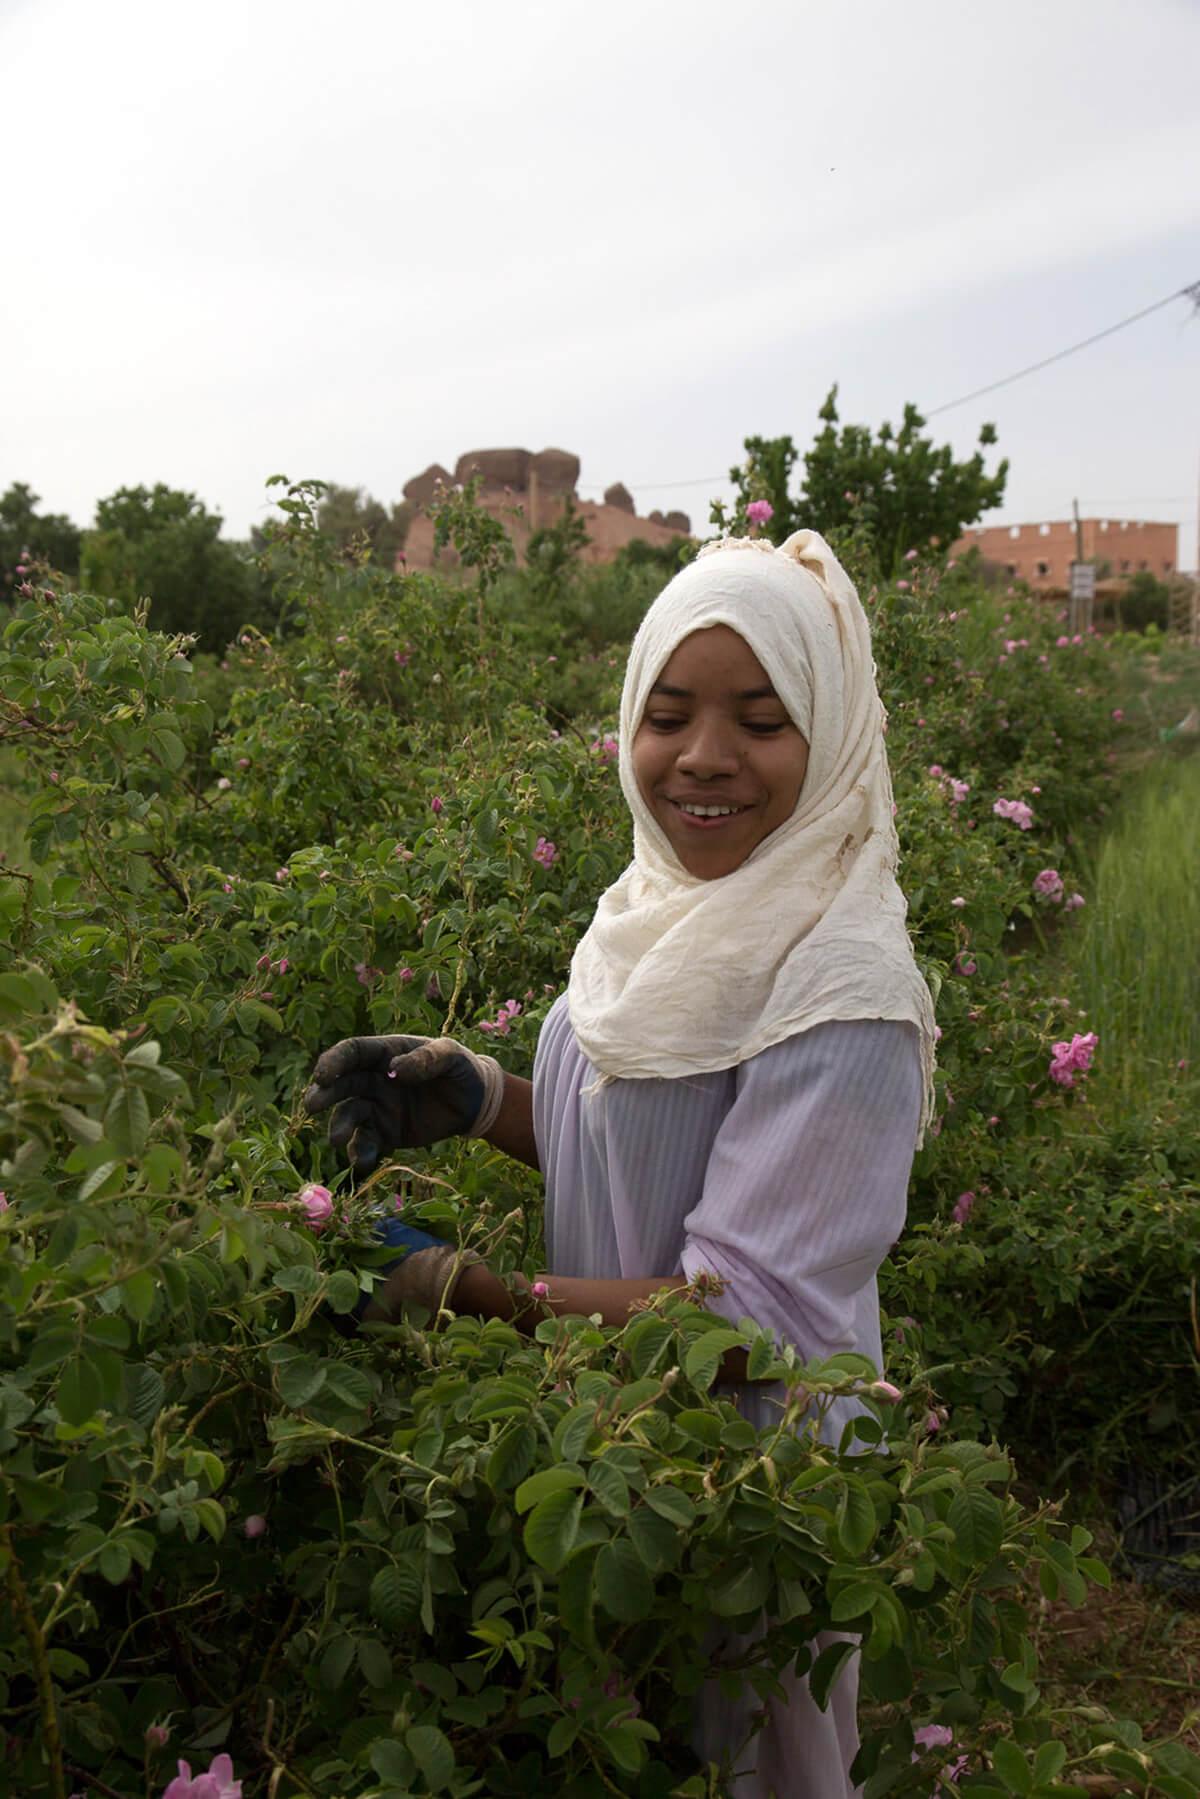 Sahara Desert Tour - Festivals: Discover a More Intimate Side of Morocco - Festival of the Roses